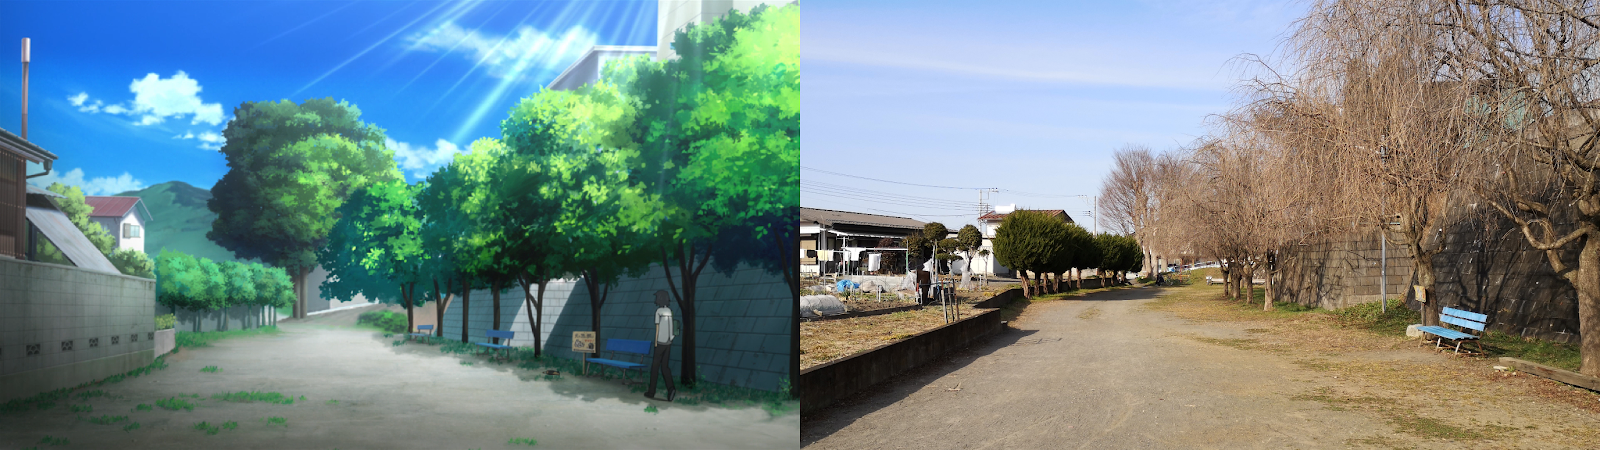 anohana, anime, real life, chichibu